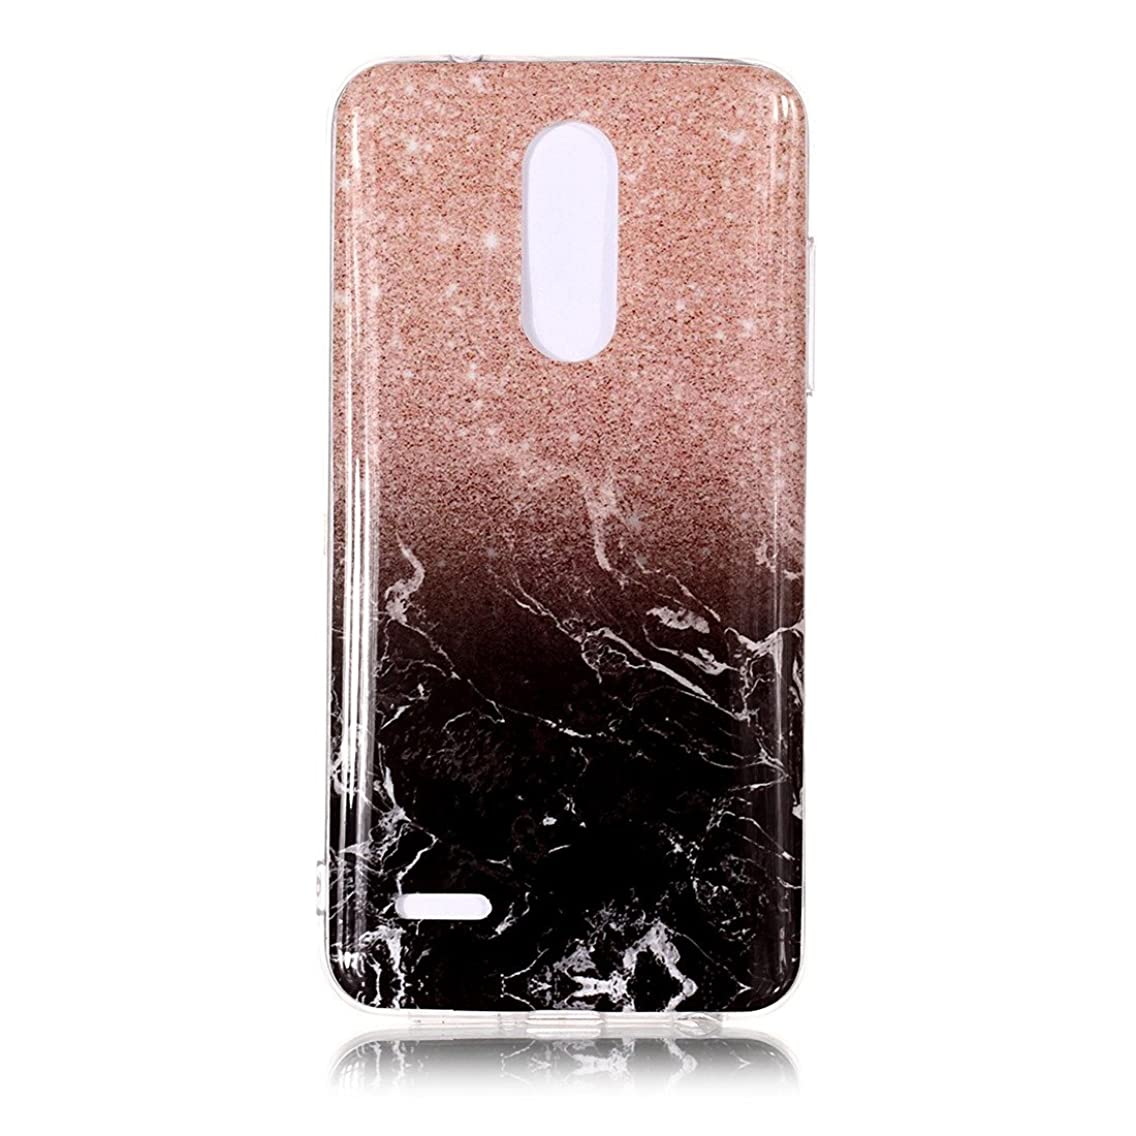 LG K10 2018 Case, LG K30 Case, Love Sound Ultra Slim Colourful Marble Design Anti-Scratch Flexible Soft TPU Rubber Shockproof Protective Phone Case Cover for LG K10 (2018) / LG K30 (Rose Gold/Black)